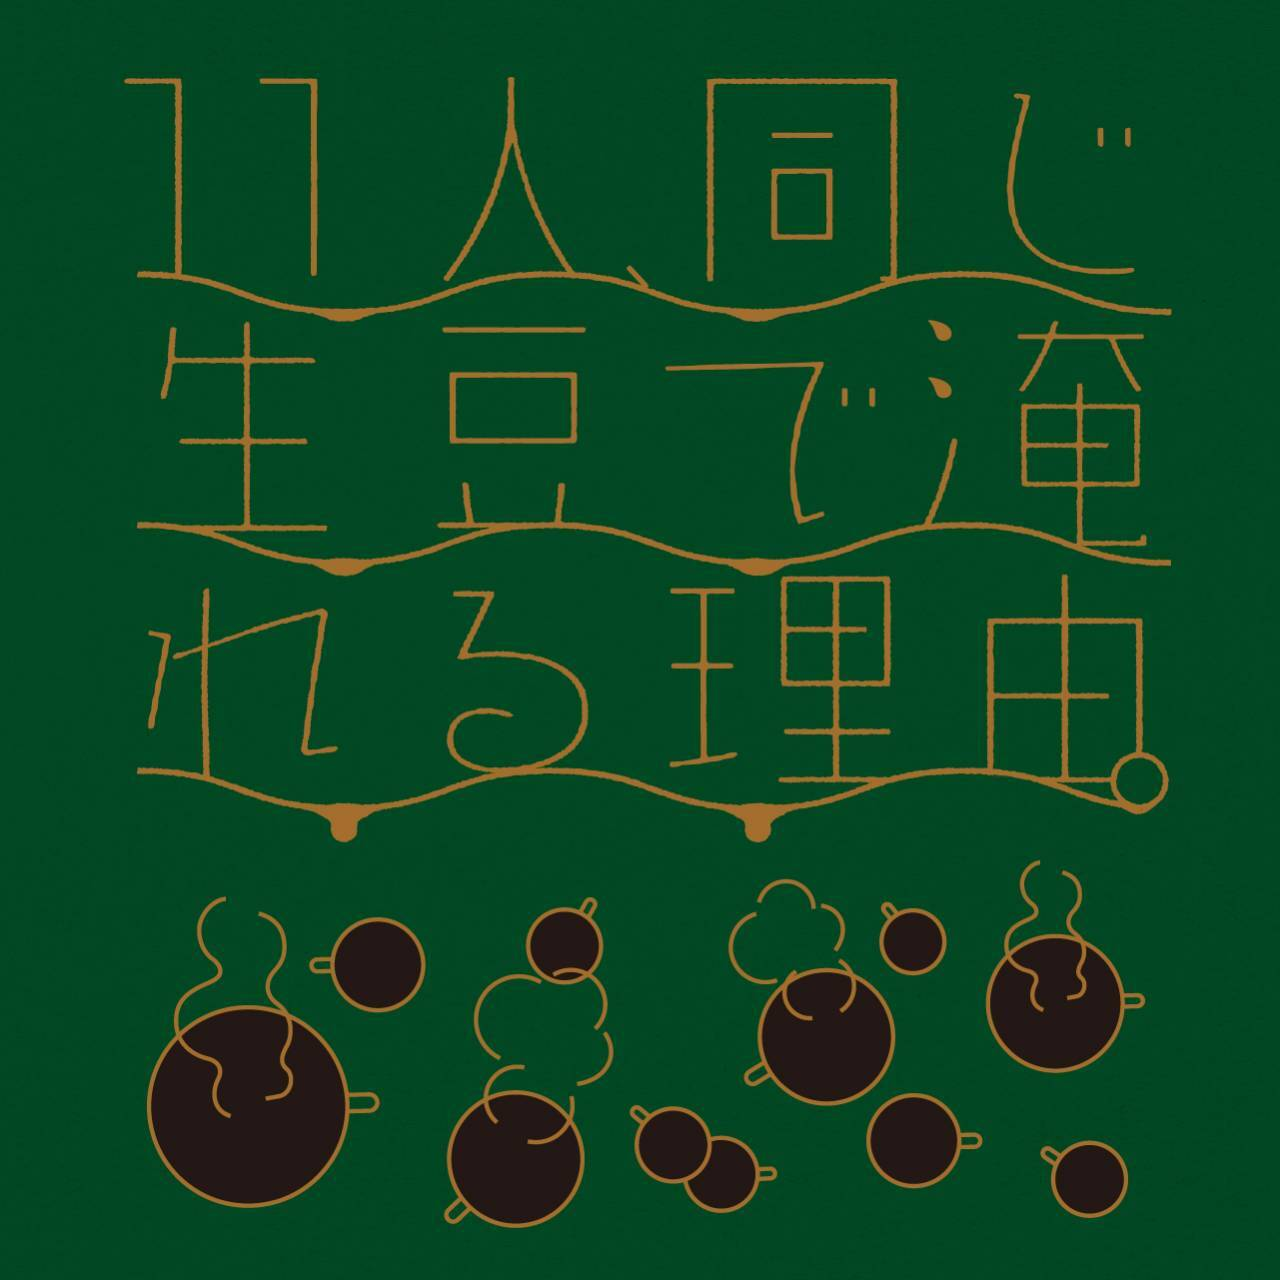 COFFEE HOLIC #1  11人同じ生豆で淹れる理由。